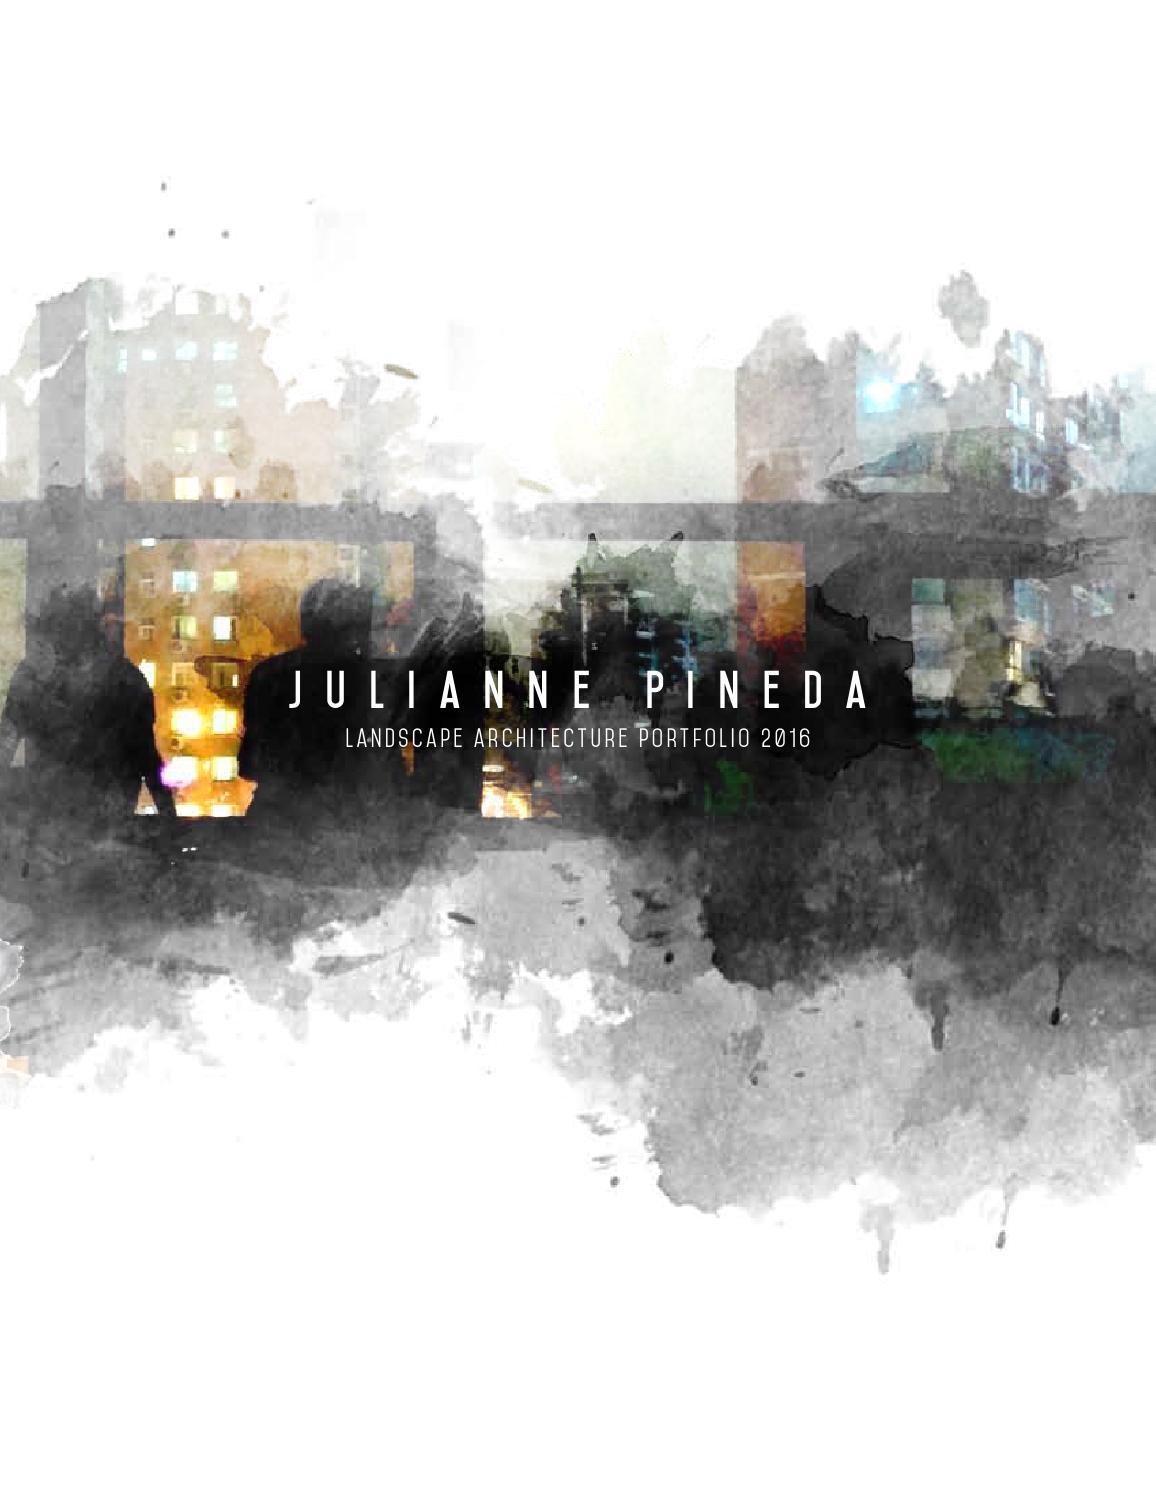 Julianne pineda landscape architecture portfolio 2016 by for Garden design portfolio